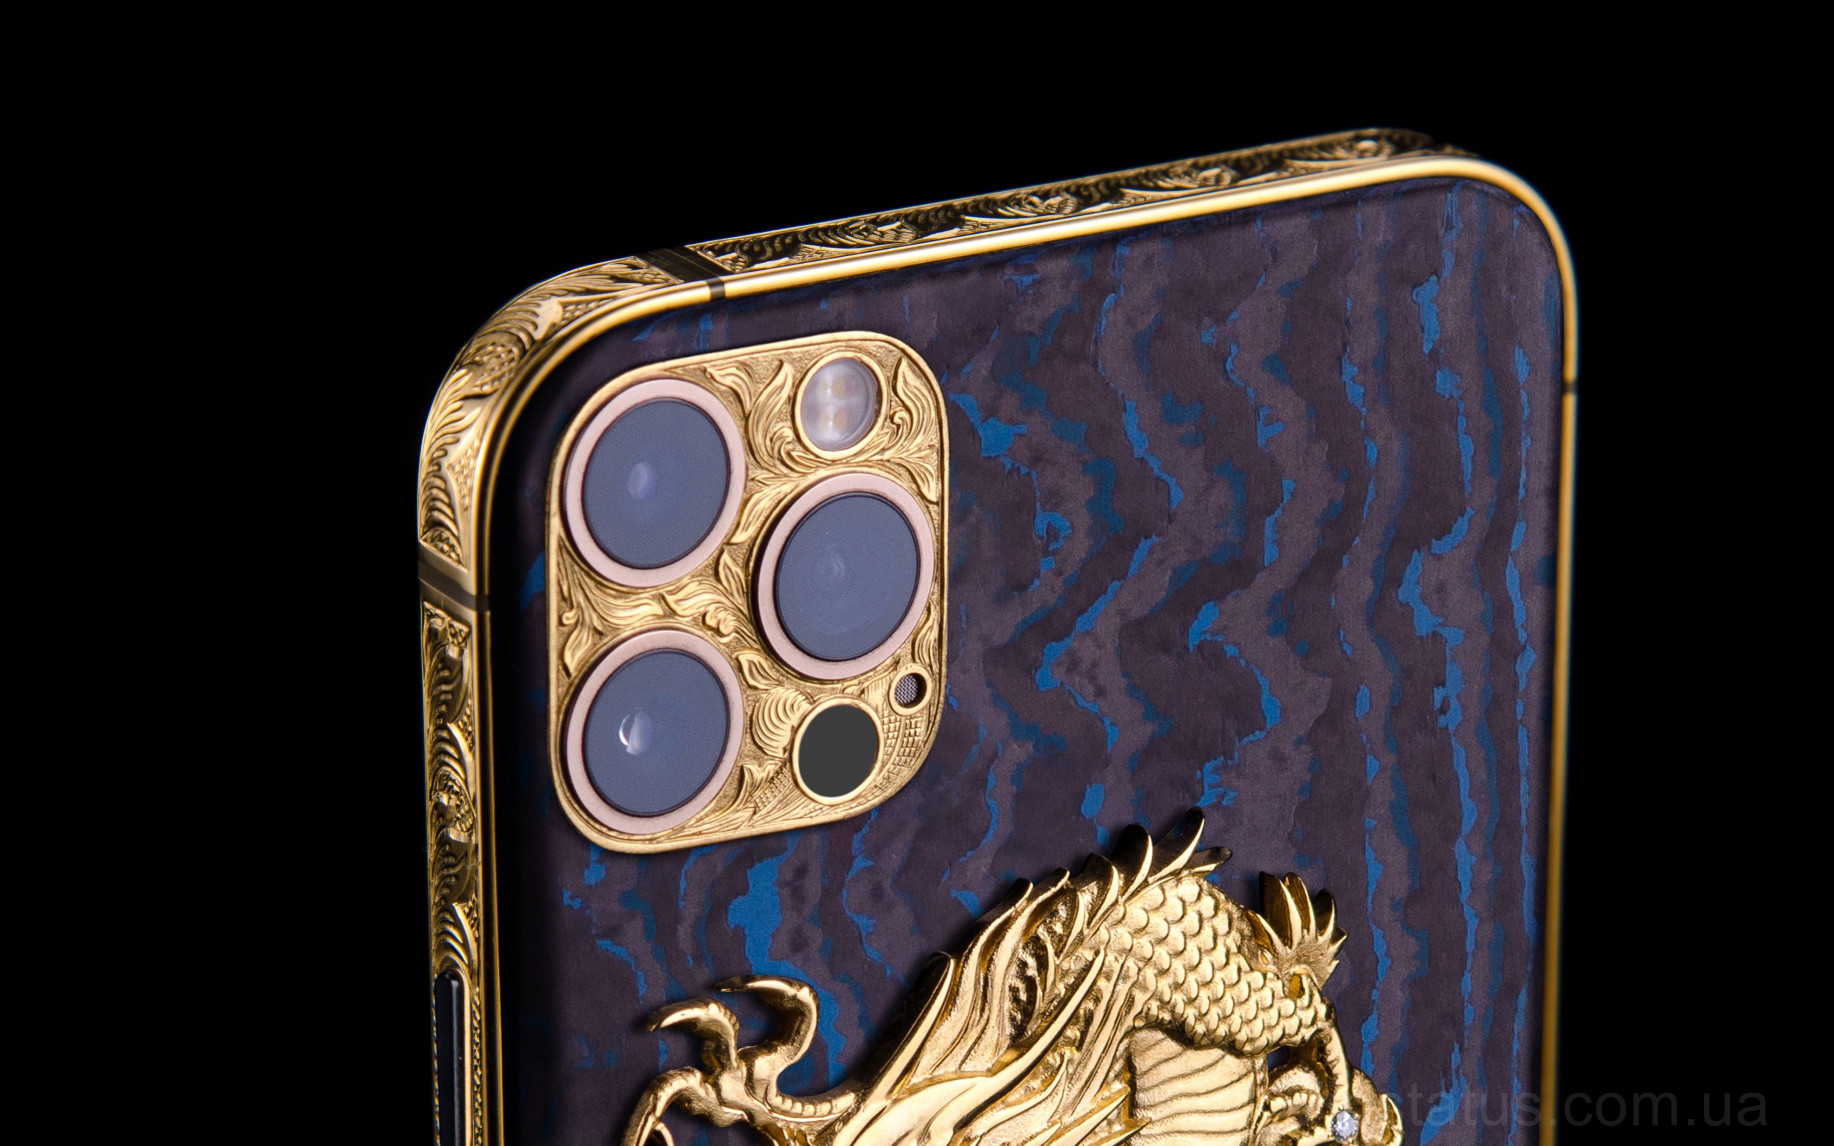 Elite Oriental Dragon IPHONE 12 PRO MAX 512 GB Oriental Dragon IPHONE 12 PRO MAX 512 GB image 20